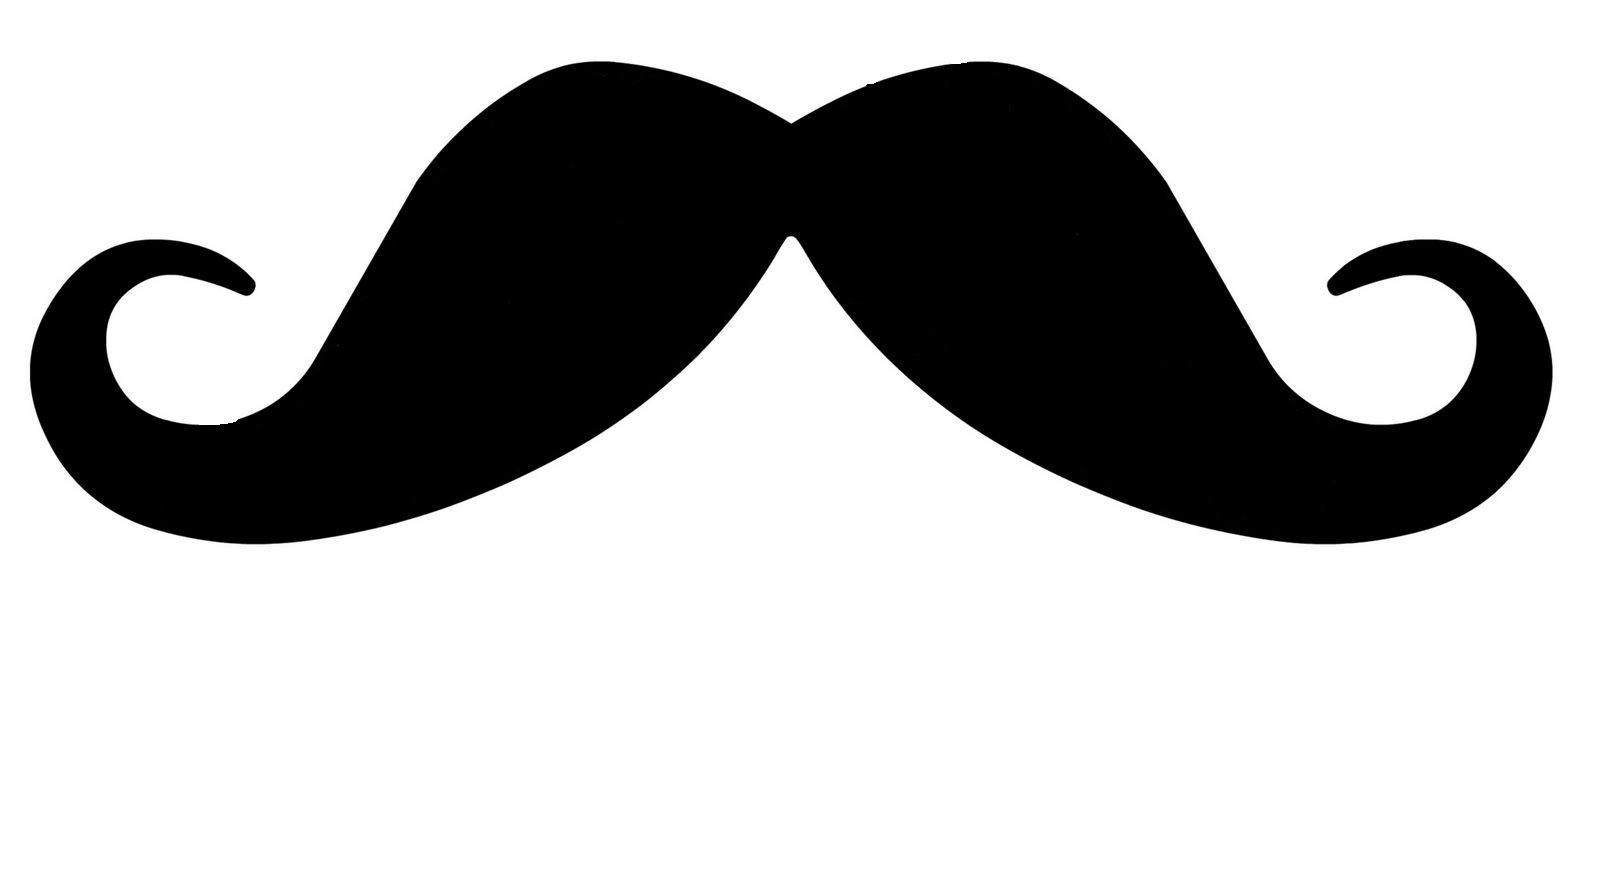 Handlebar Mustache Clip Art Moustache Ou-Handlebar Mustache Clip Art Moustache Outline Clipart-3